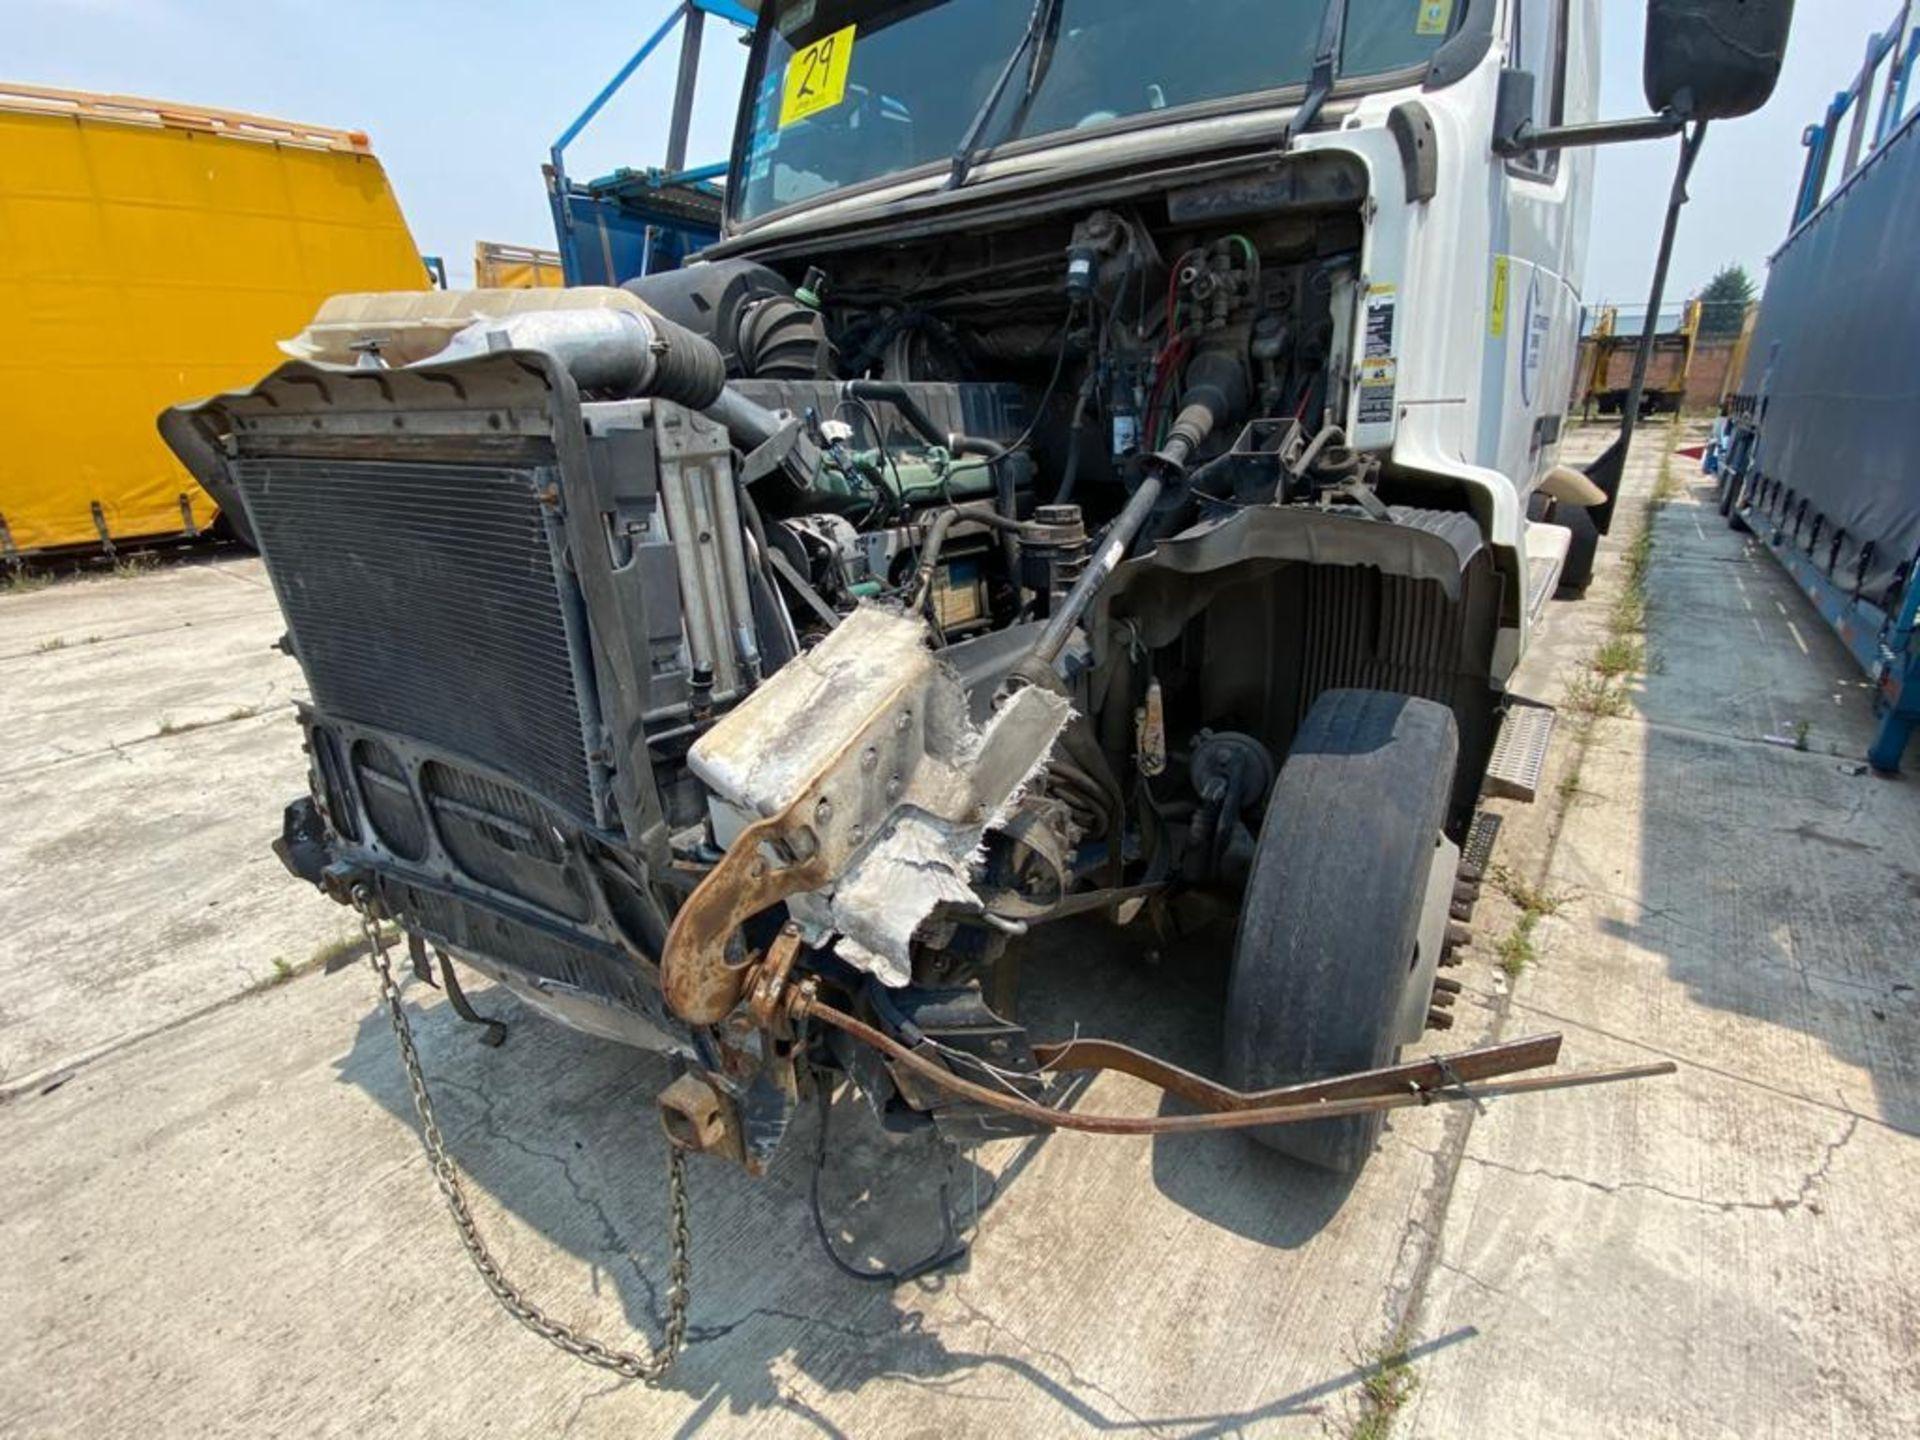 2001 Volvo Sleeper Truck Tractor, estándar transmissión of 18 speeds, with Volvo motor - Image 33 of 60